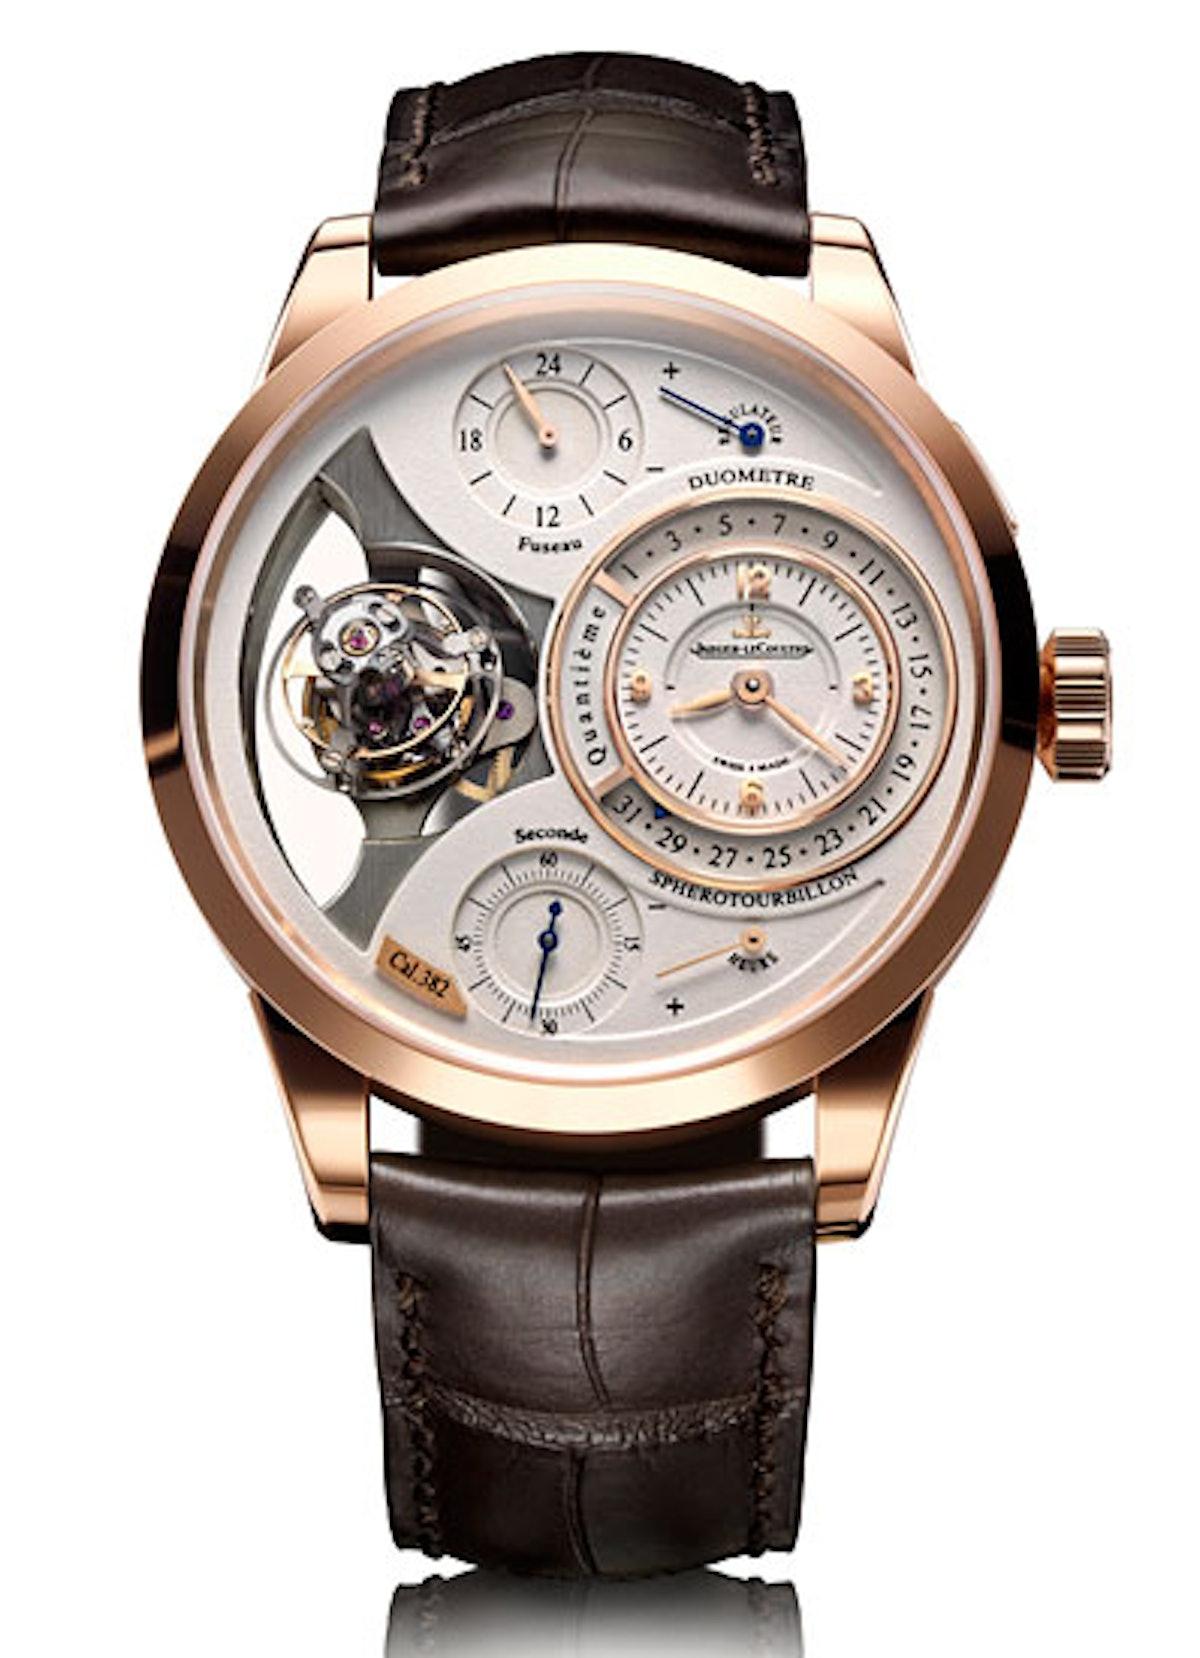 acss-geneva-watches-07-v.jpg